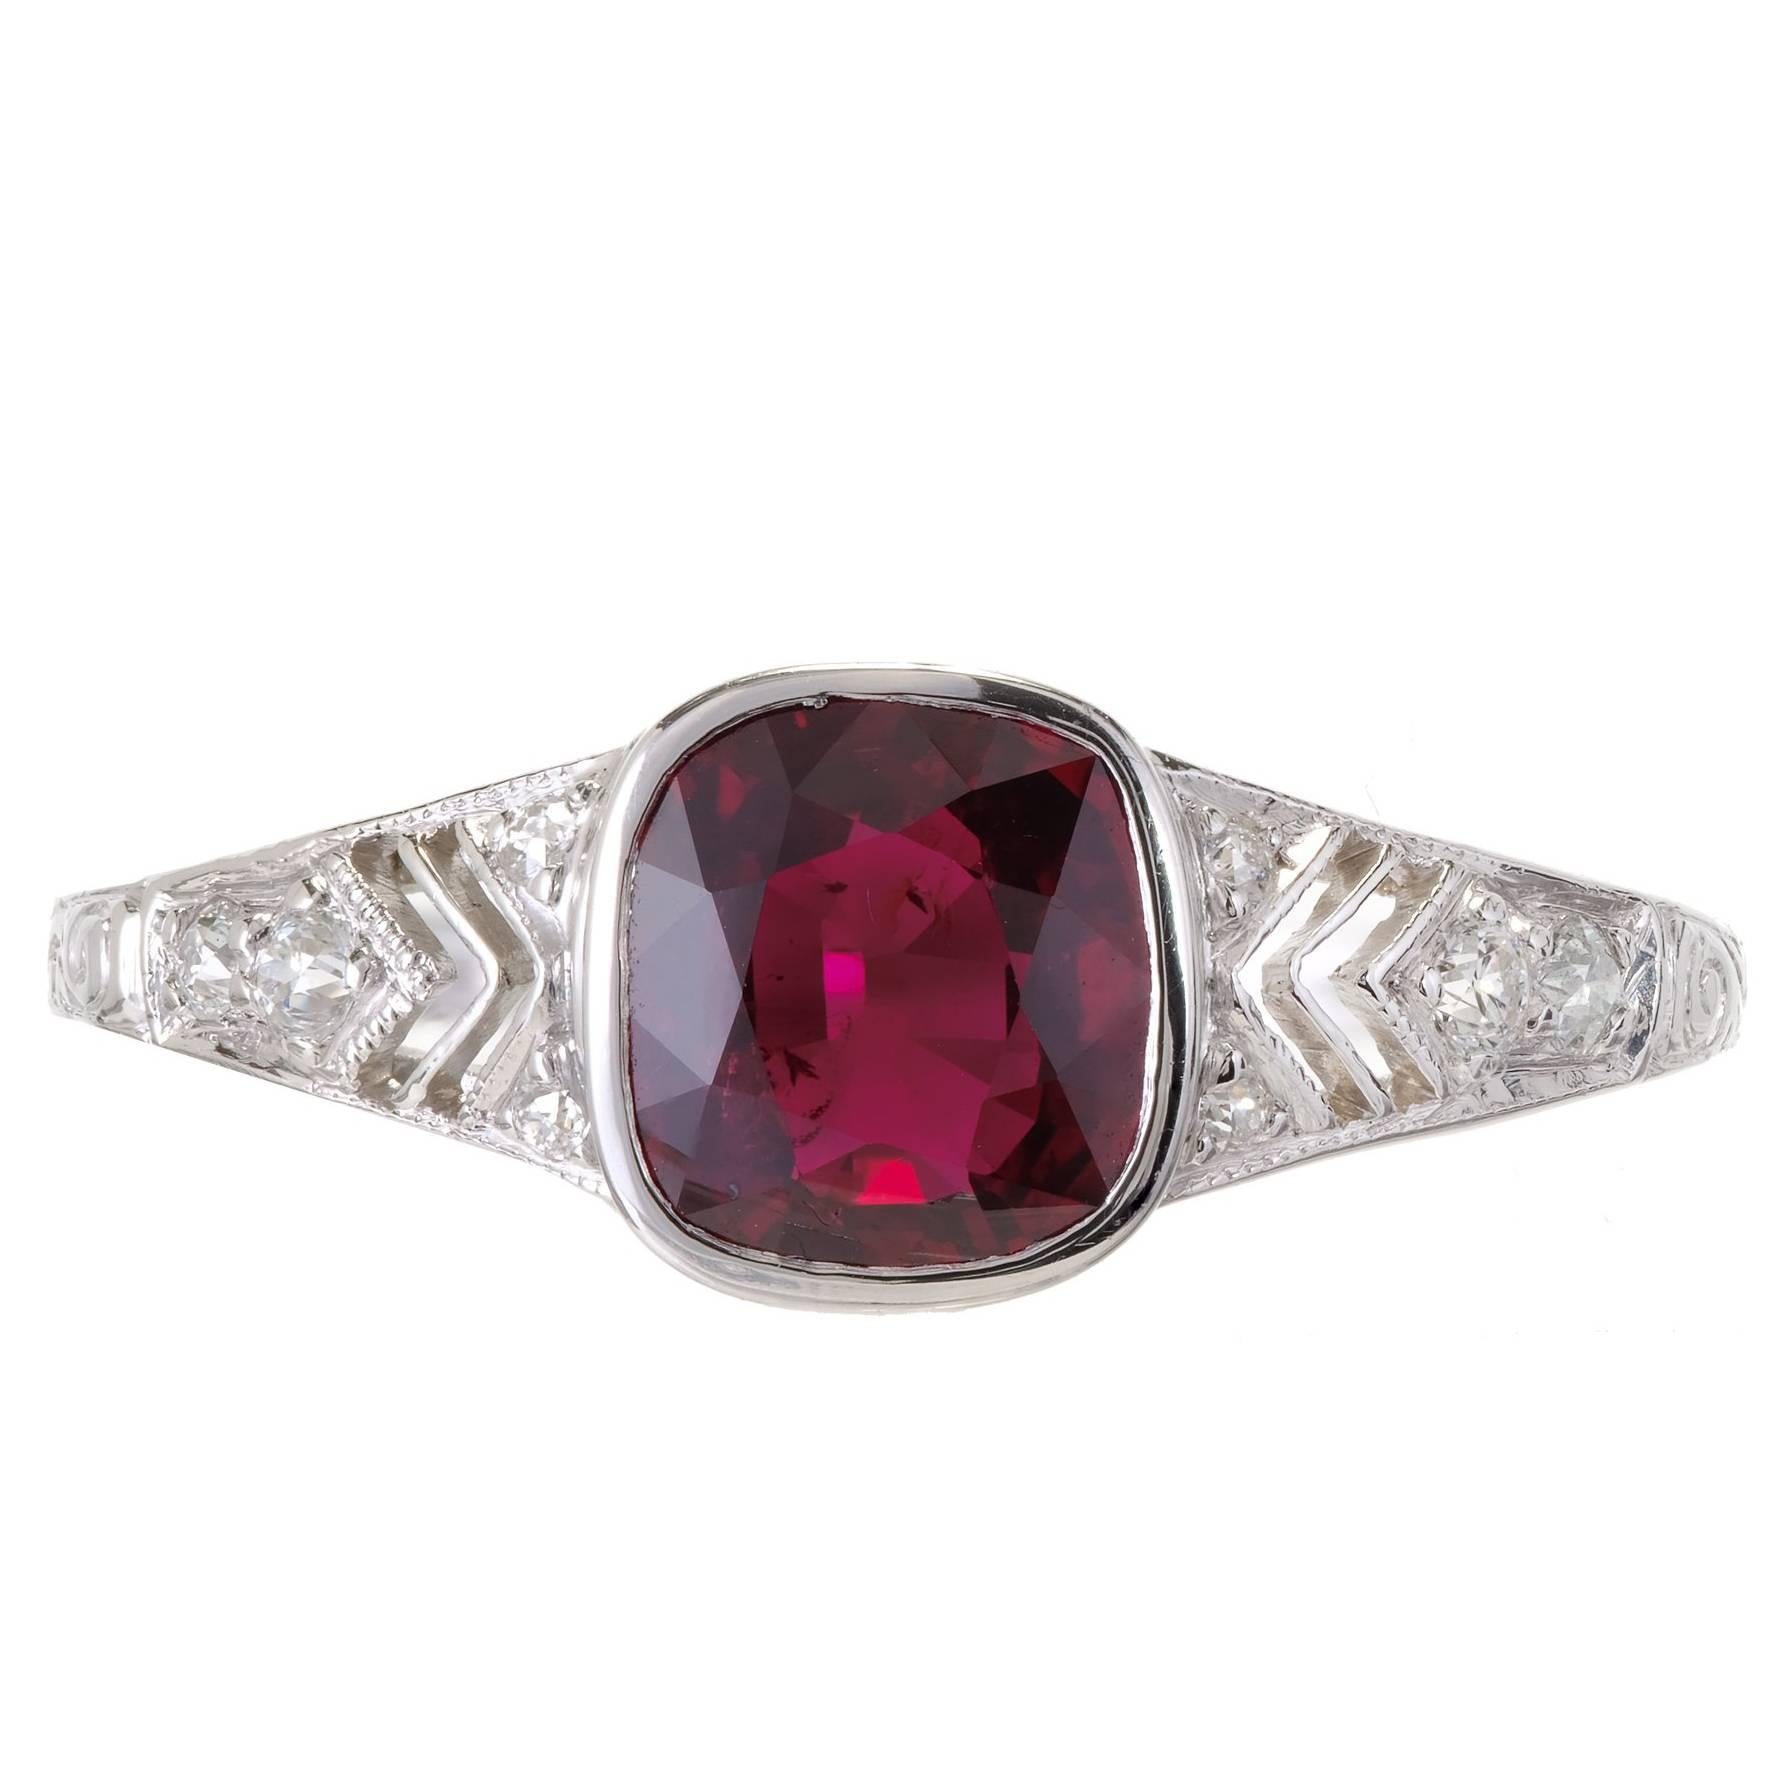 Tiffany & Co. GIA Certified 1.52 Carat Ruby Diamond Platinum Engagement Ring